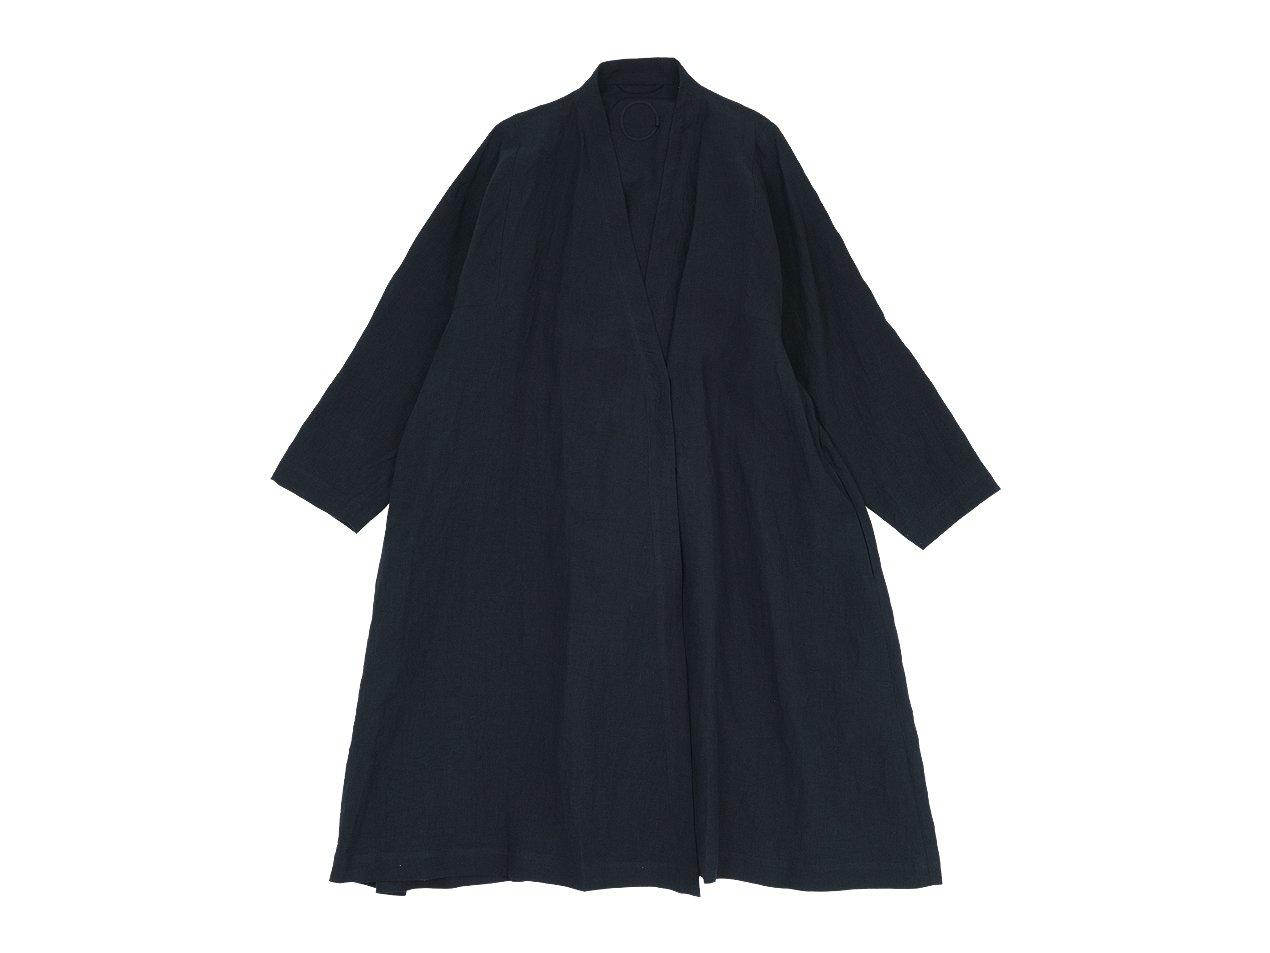 Atelier d'antan Valery(ヴァレリー) Coat BLACK